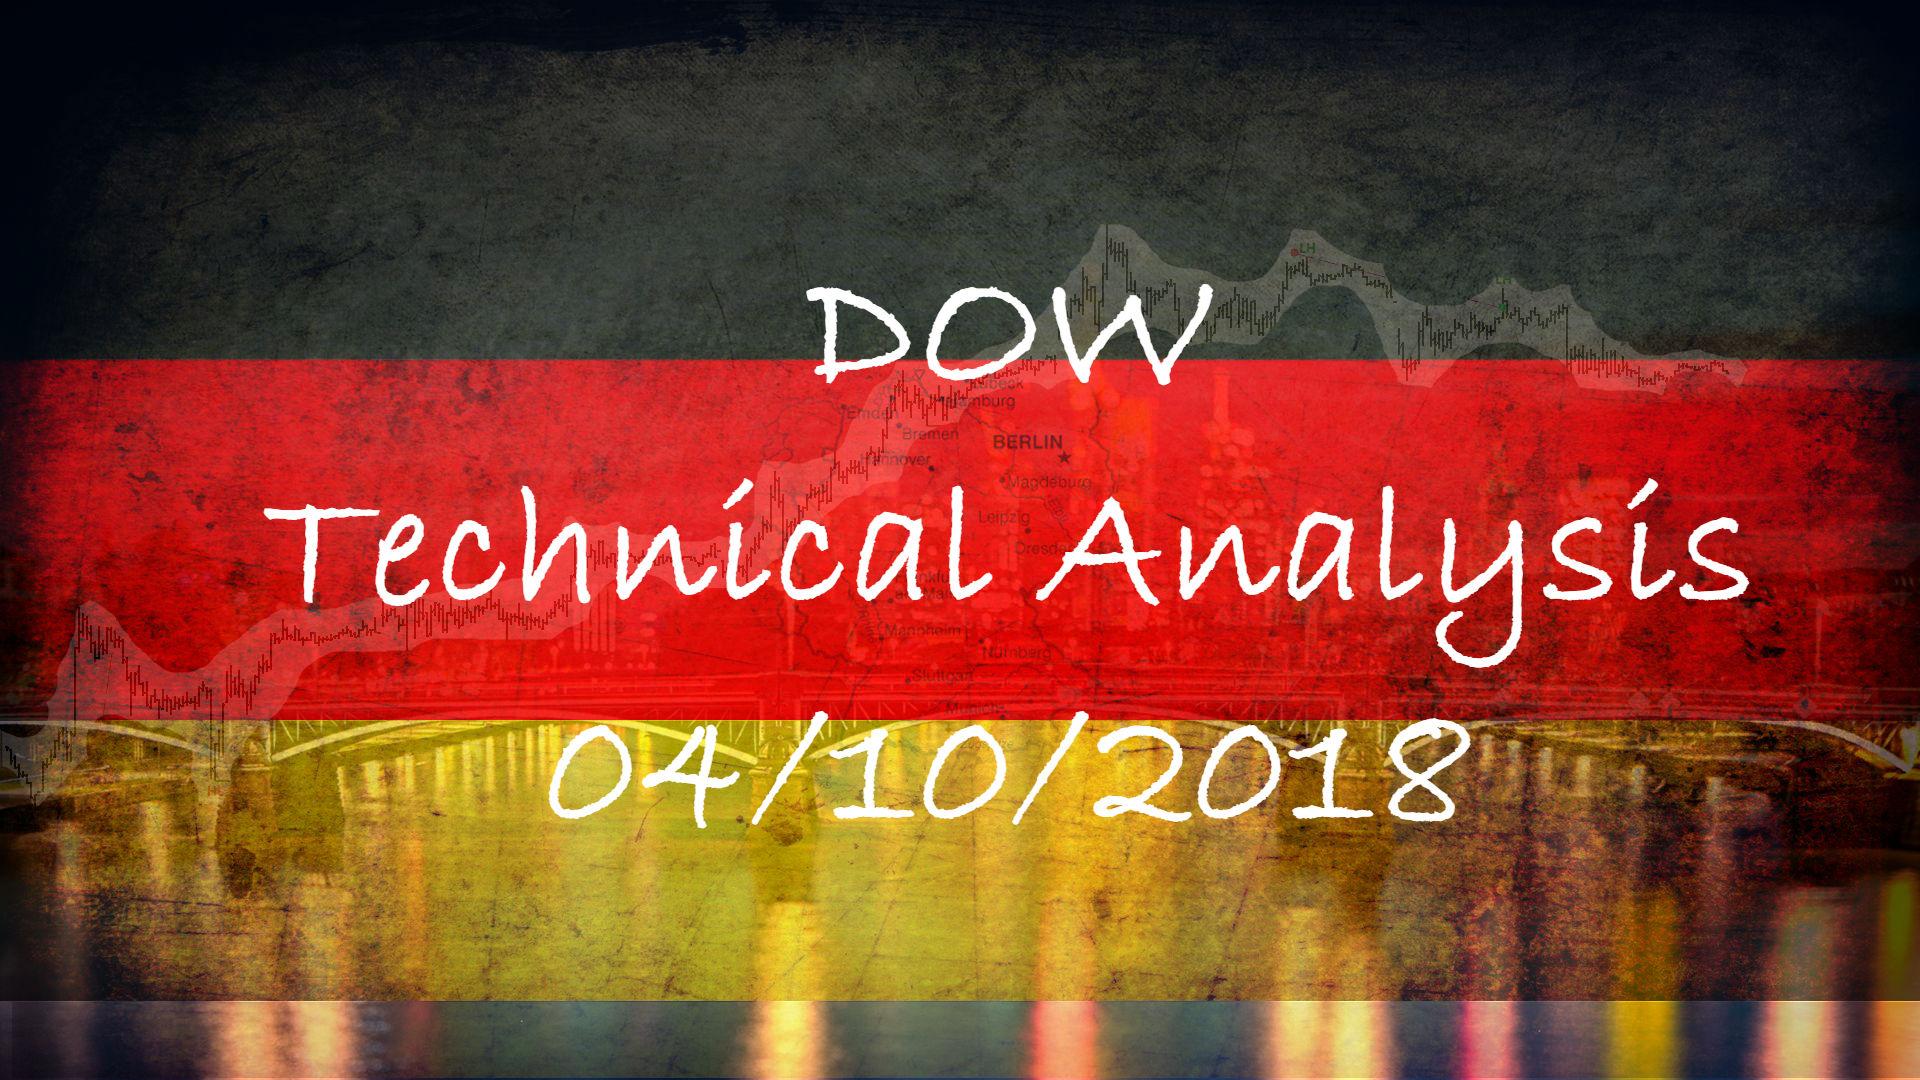 04-10-2018 DOW Analysis